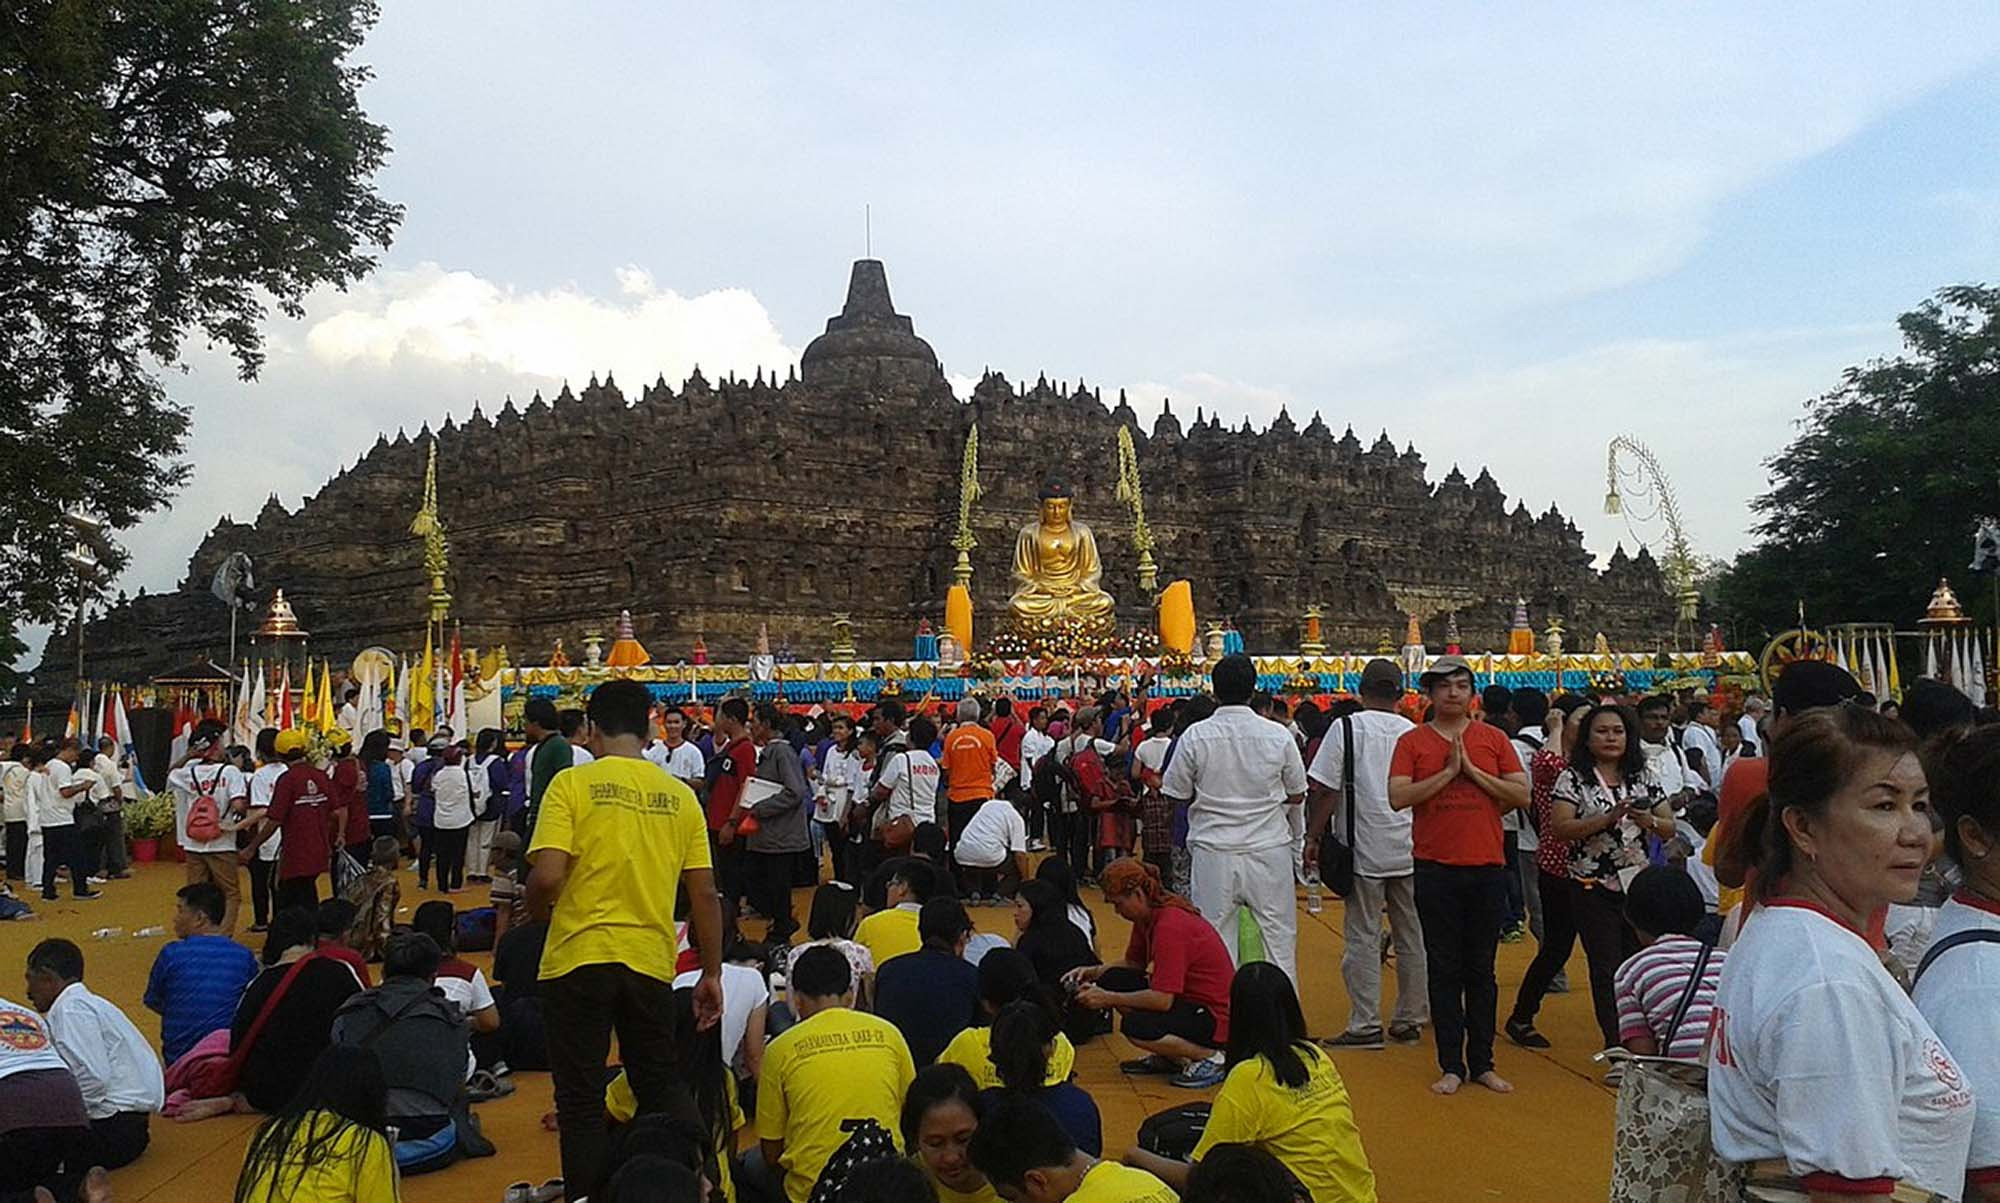 Temple on Vesak day, Borobodur, Indonesia, 2015